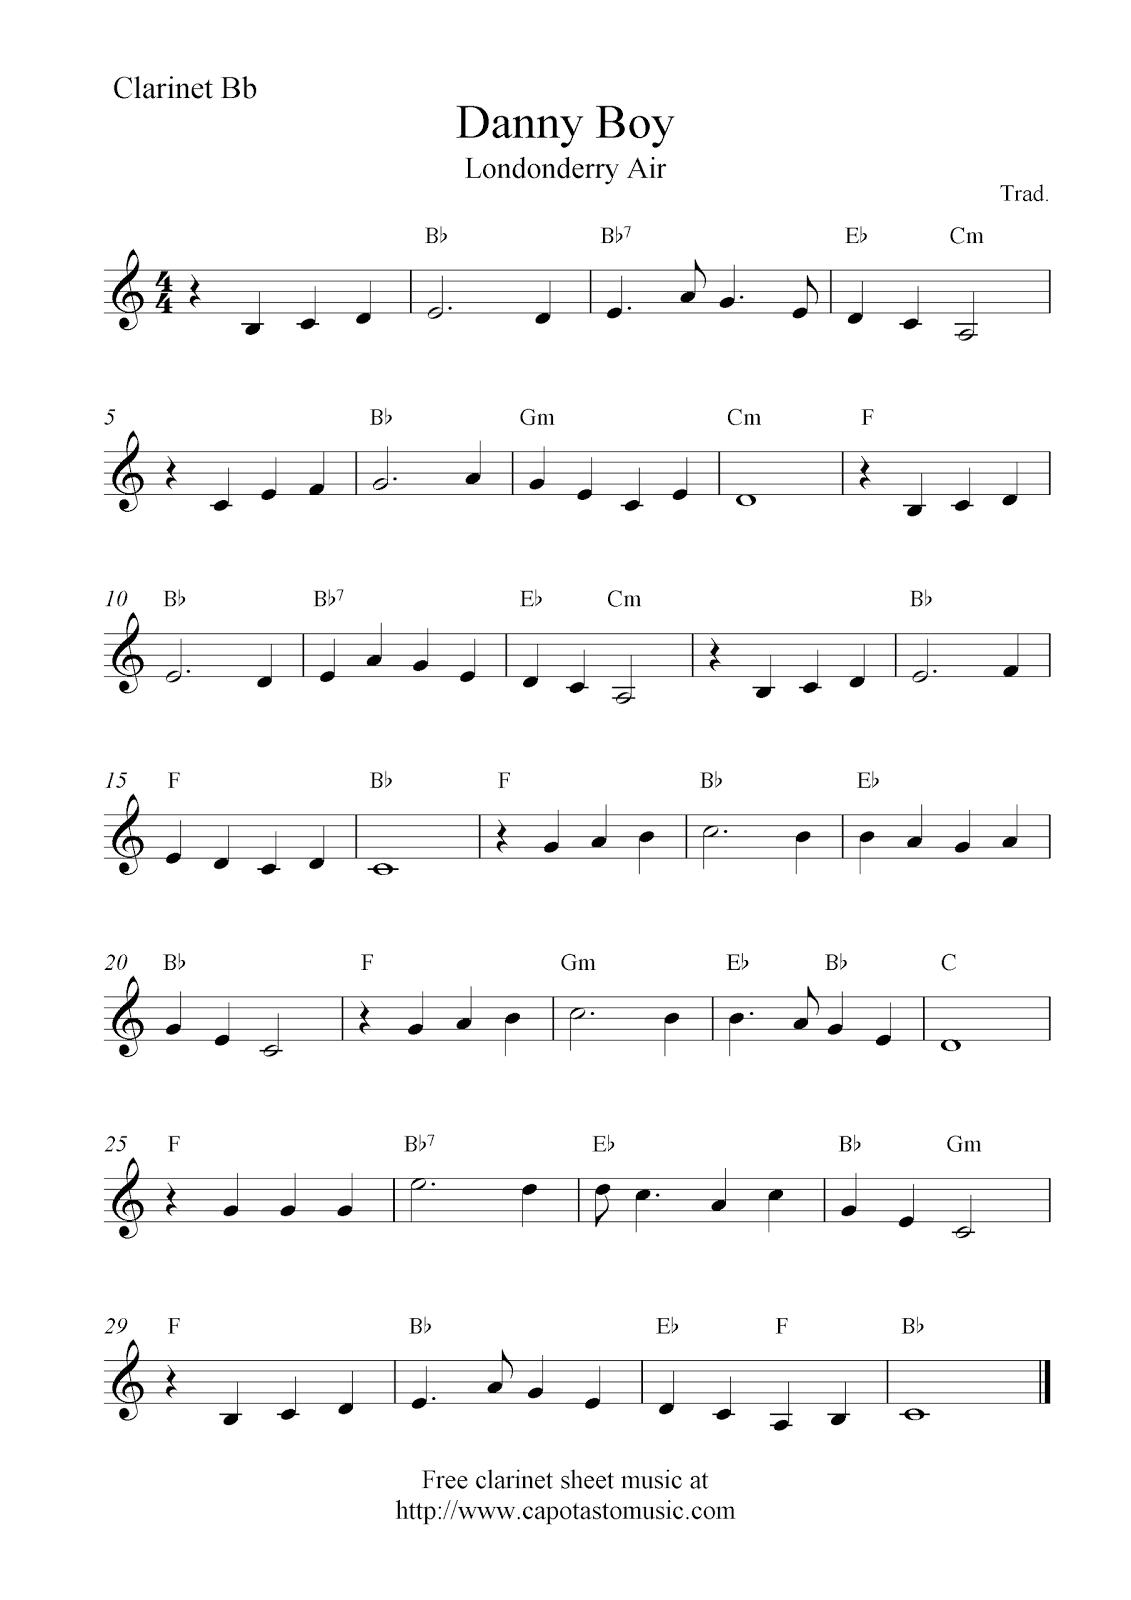 Danny Boy (Londonderry Air), Free Clarinet Sheet Music Notes - Free Printable Clarinet Sheet Music